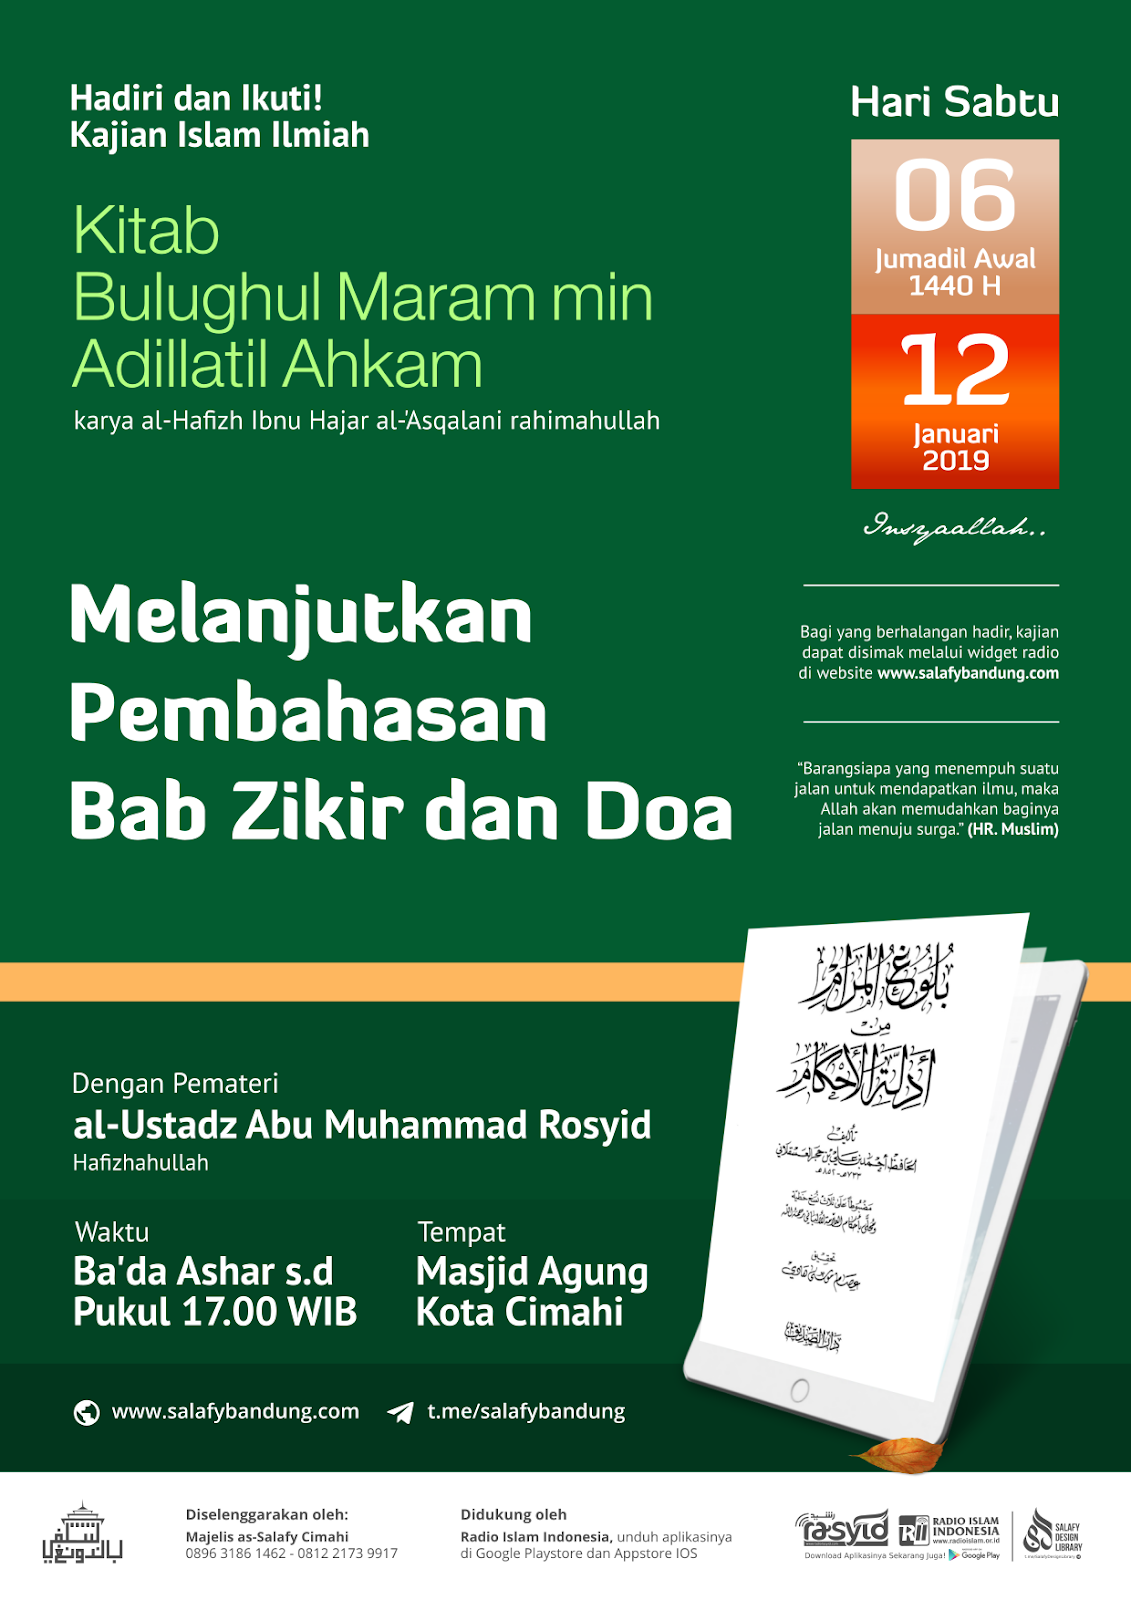 Audio Kajian Kitab al-Jami': Melanjutkan Pembahasan Hadits-Hadits tentang Doa